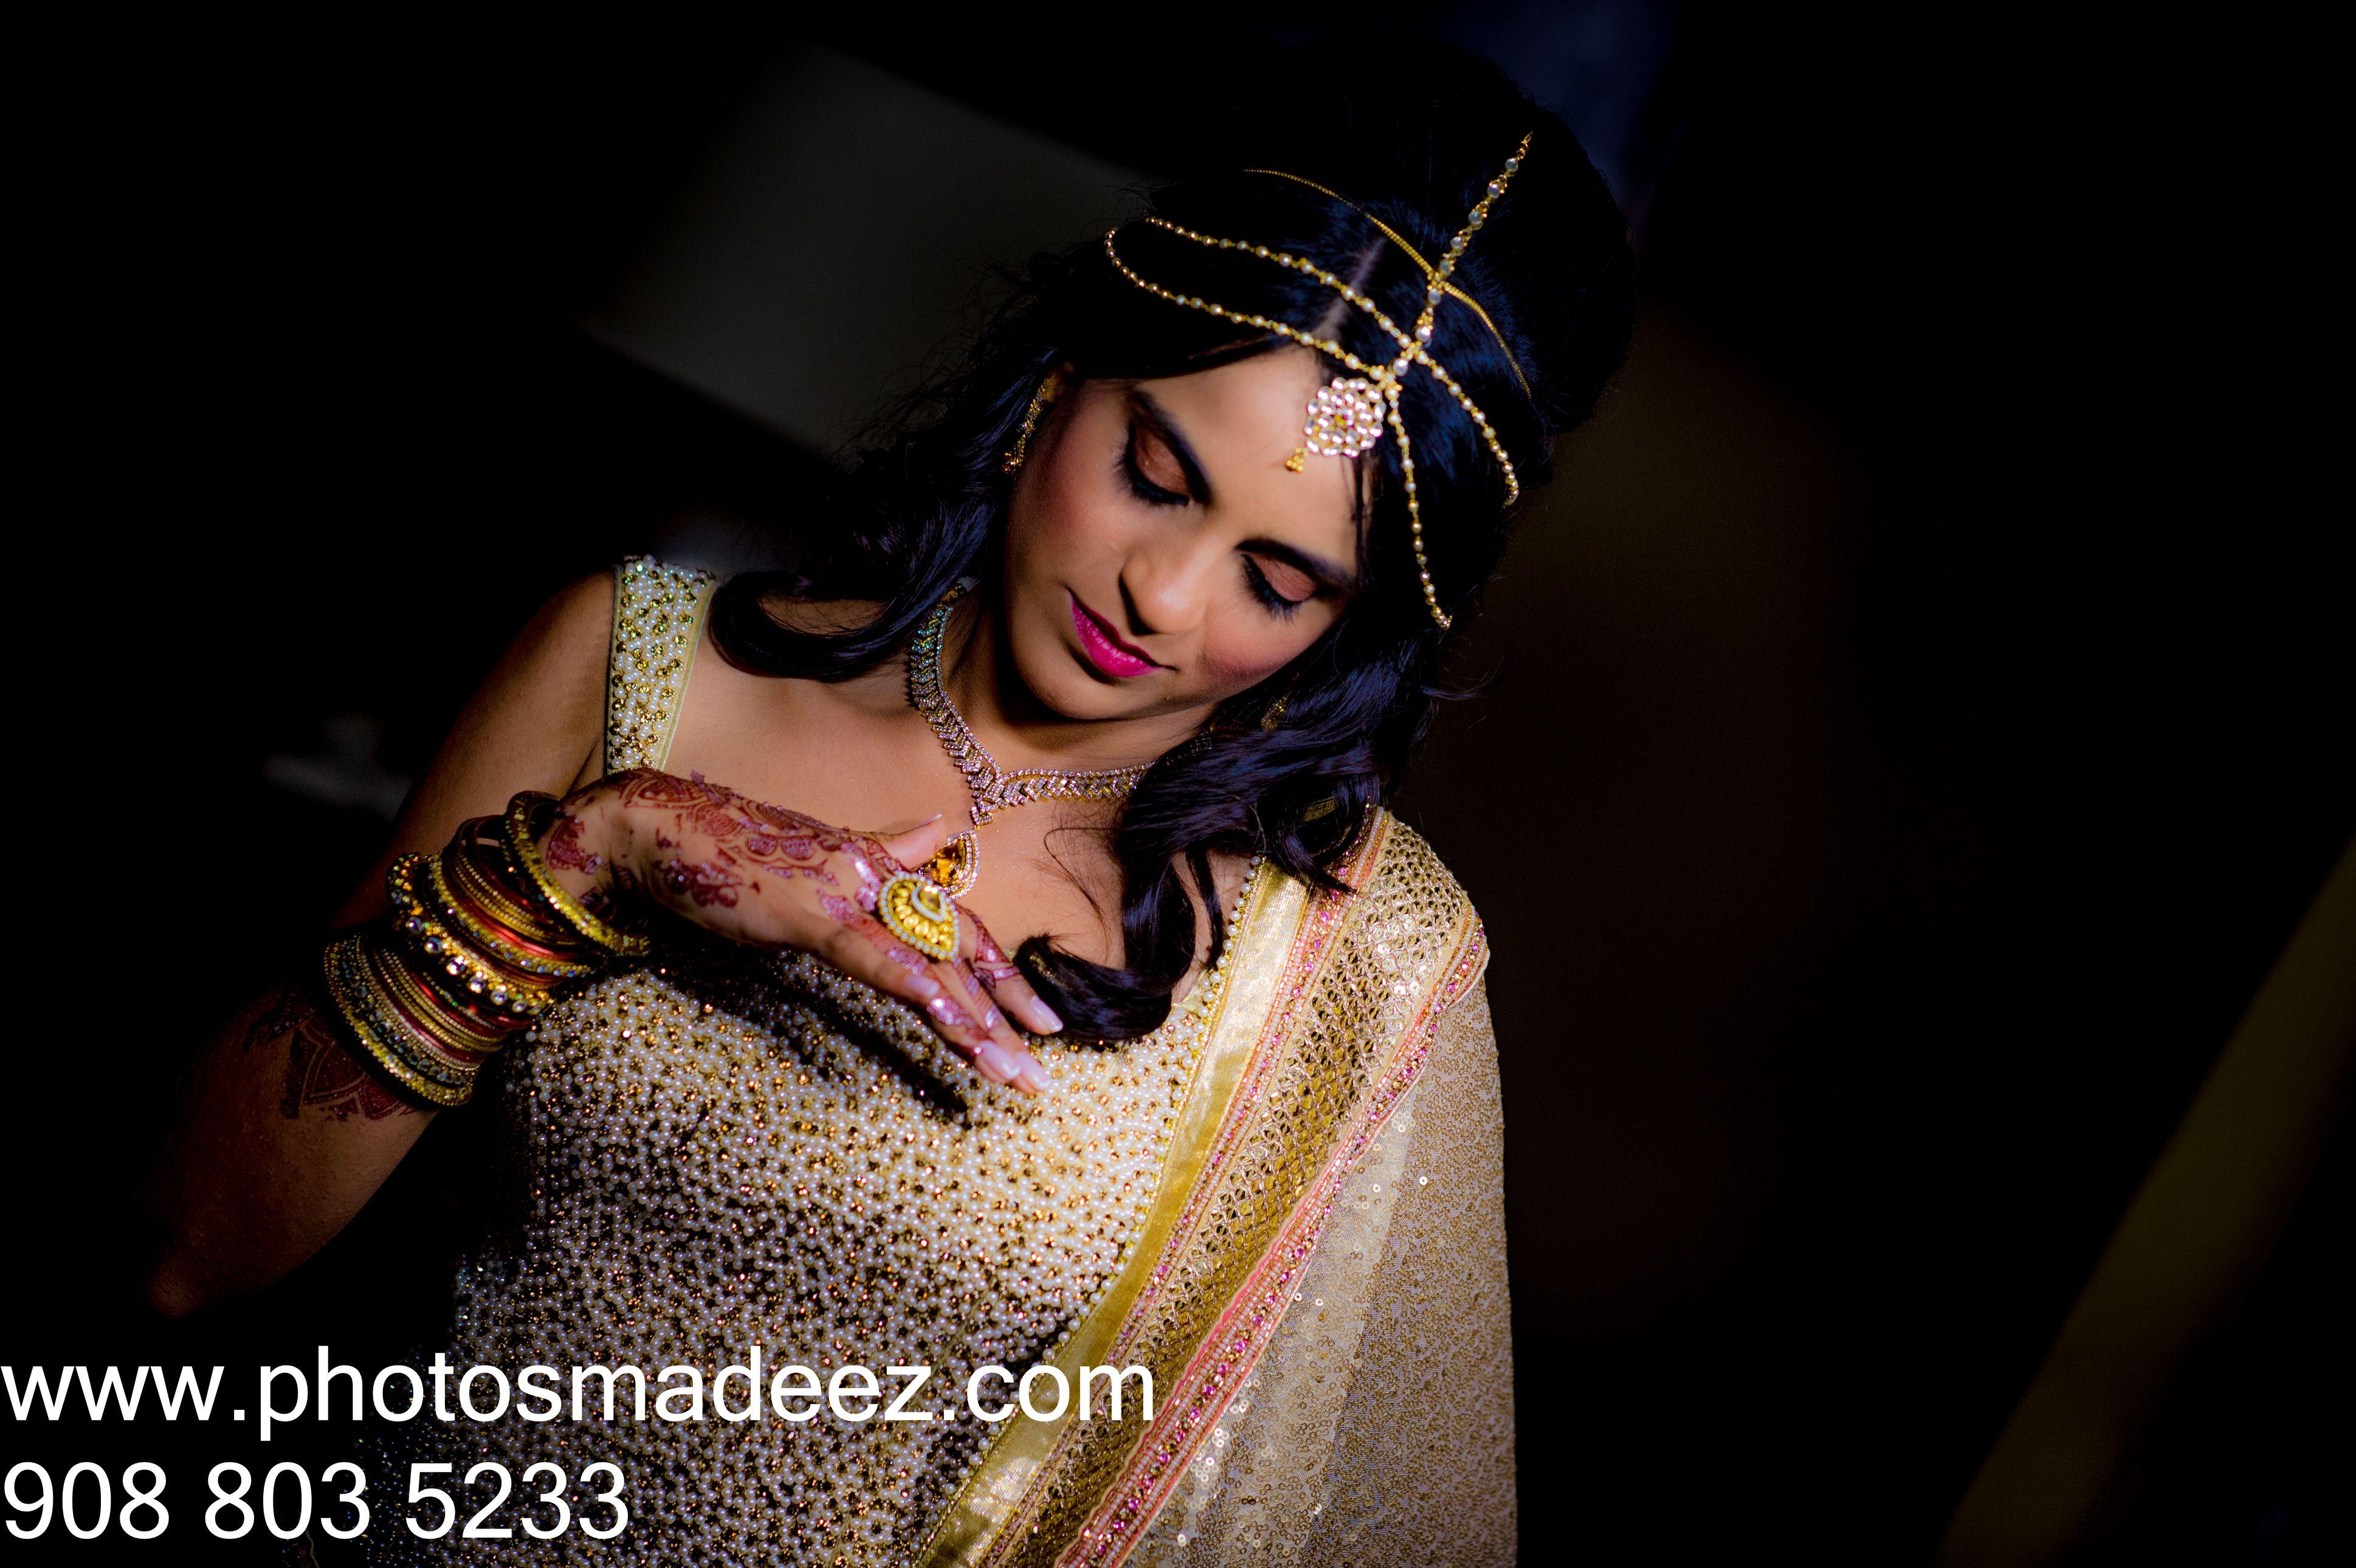 Bride Portrait At Mixed Wedding In Connecticut Gujarati Italian Groom Center